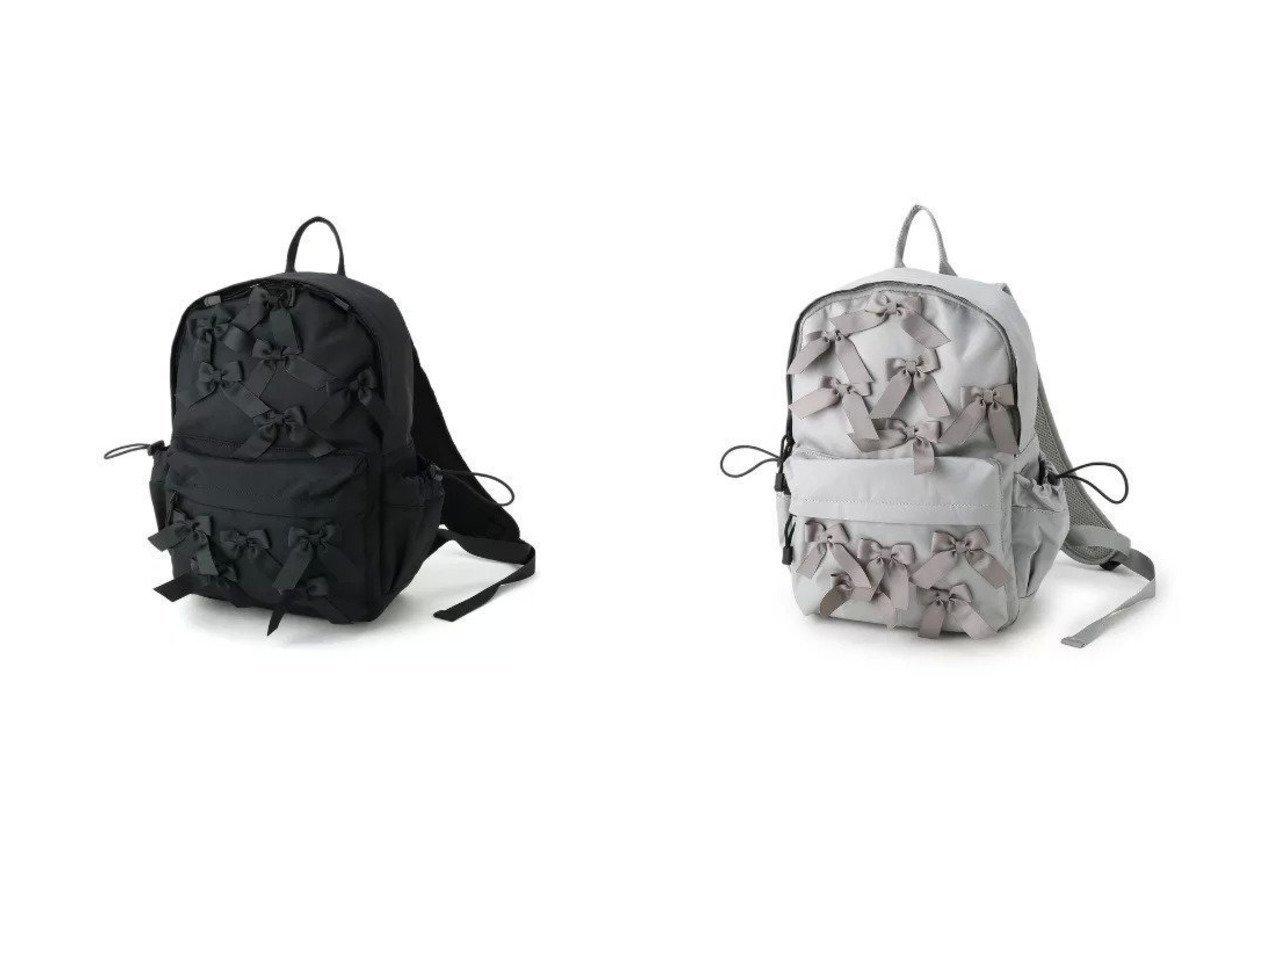 【Couture Brooch/クチュール ブローチ】の【メニーリボンシリーズ】メニーリボンリュック 【バッグ・鞄】おすすめ!人気、トレンド・レディースファッションの通販 | レディースファッション・服の通販 founy(ファニー)